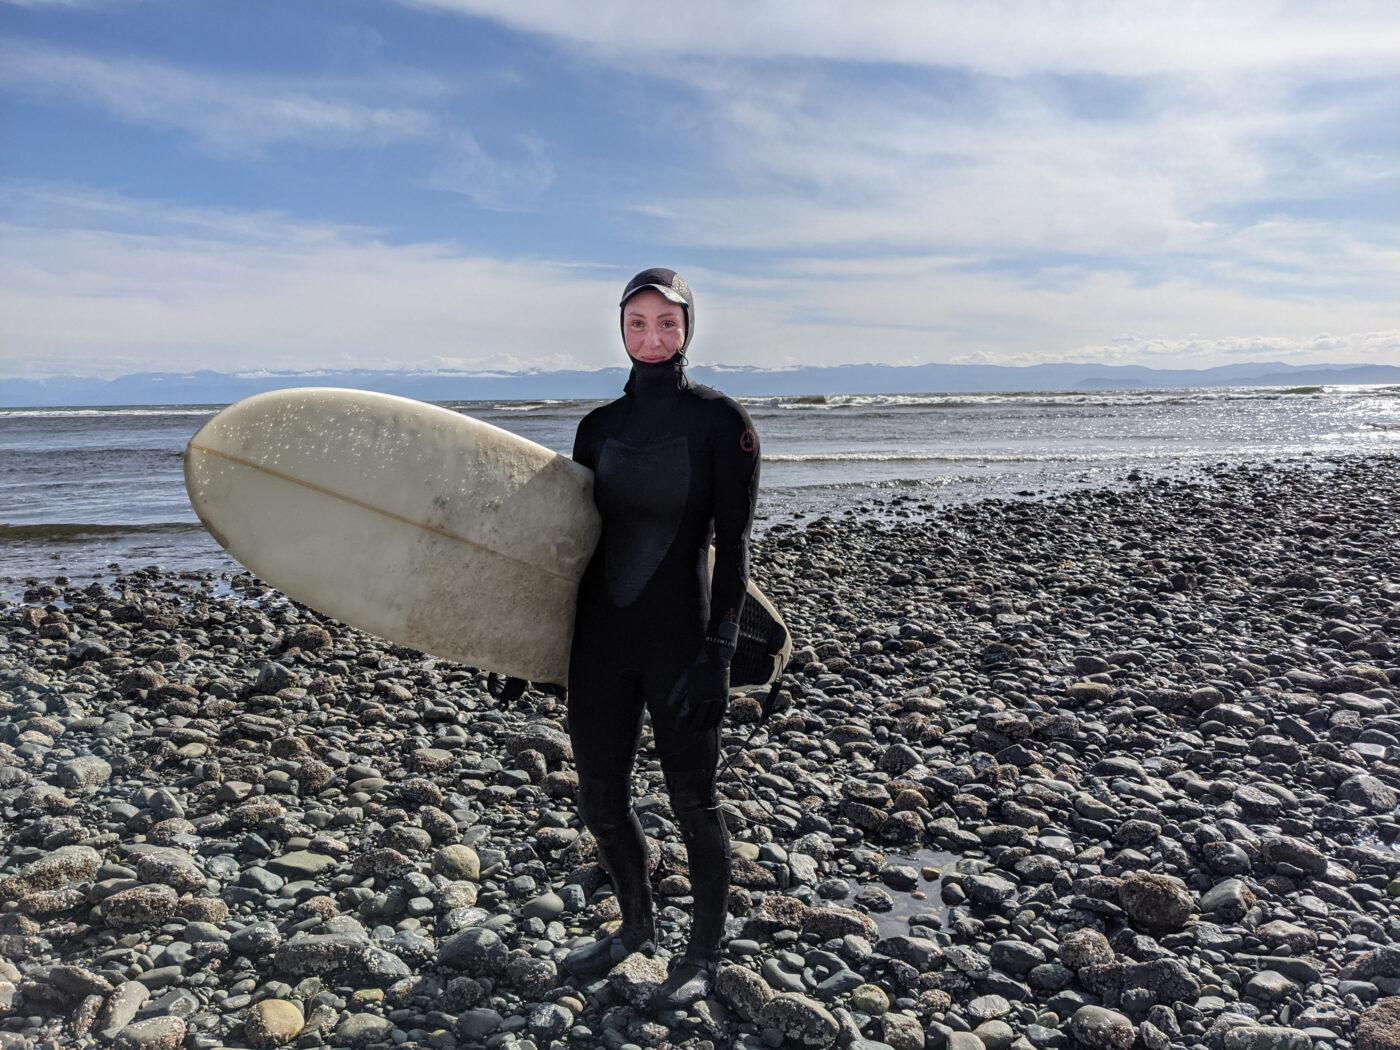 Elana holding her surfboard at Jordan River